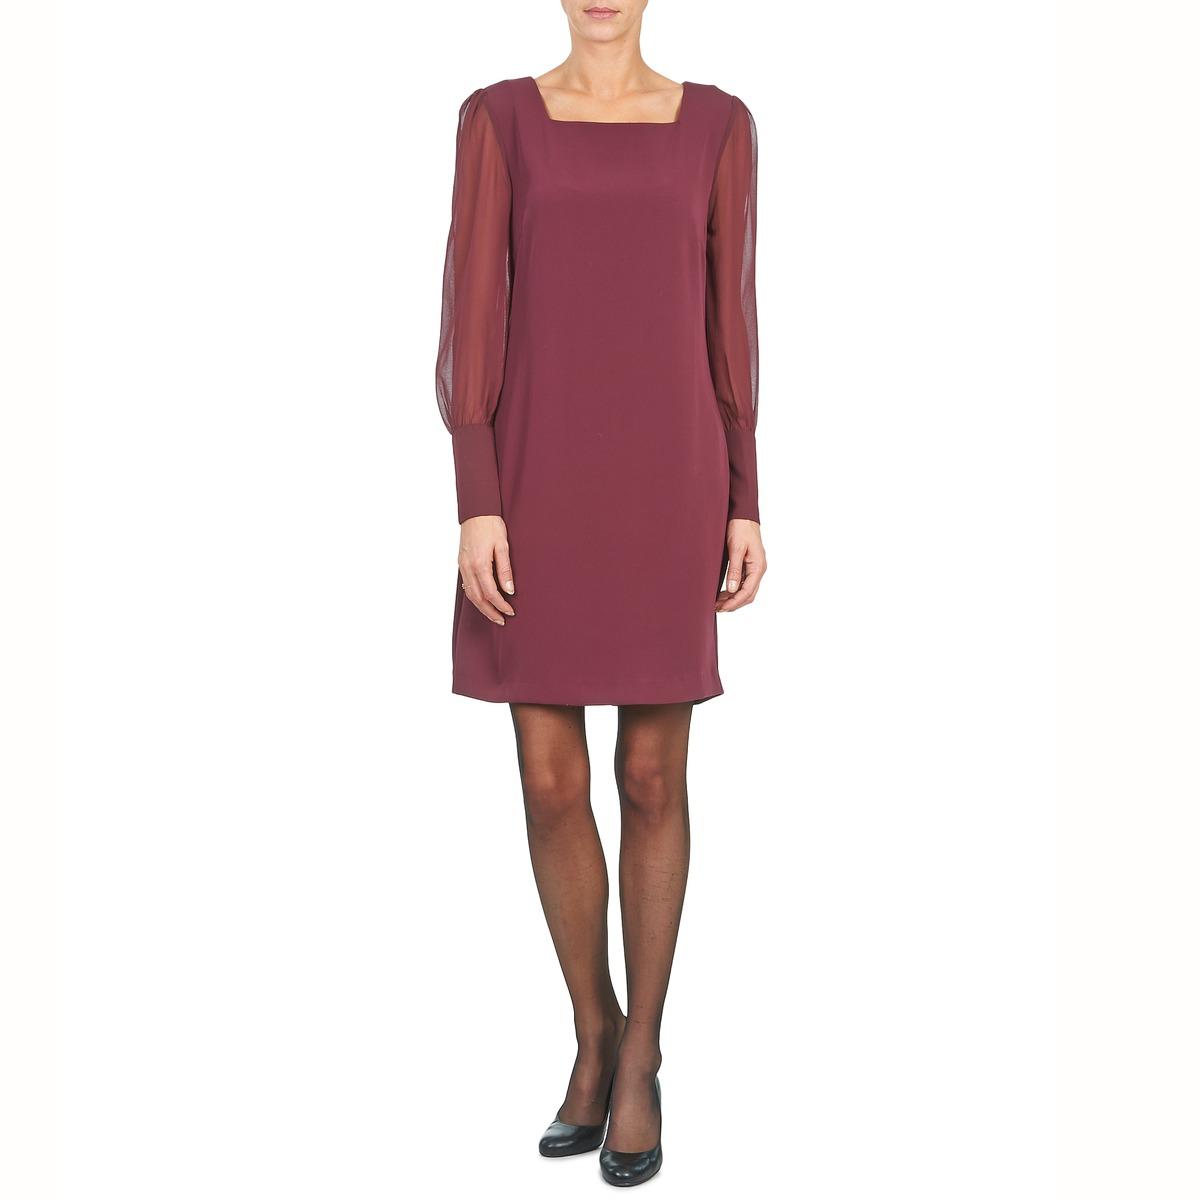 d725068068d Κοντά Φορέματα Mexx JAJAVA Σύνθεση: Πολυεστέρας, ΓΥΝΑΙΚΑ | ΡΟΥΧΑ | ΦΟΡΕΜΑΤΑ  | ΚΟΝΤΑ